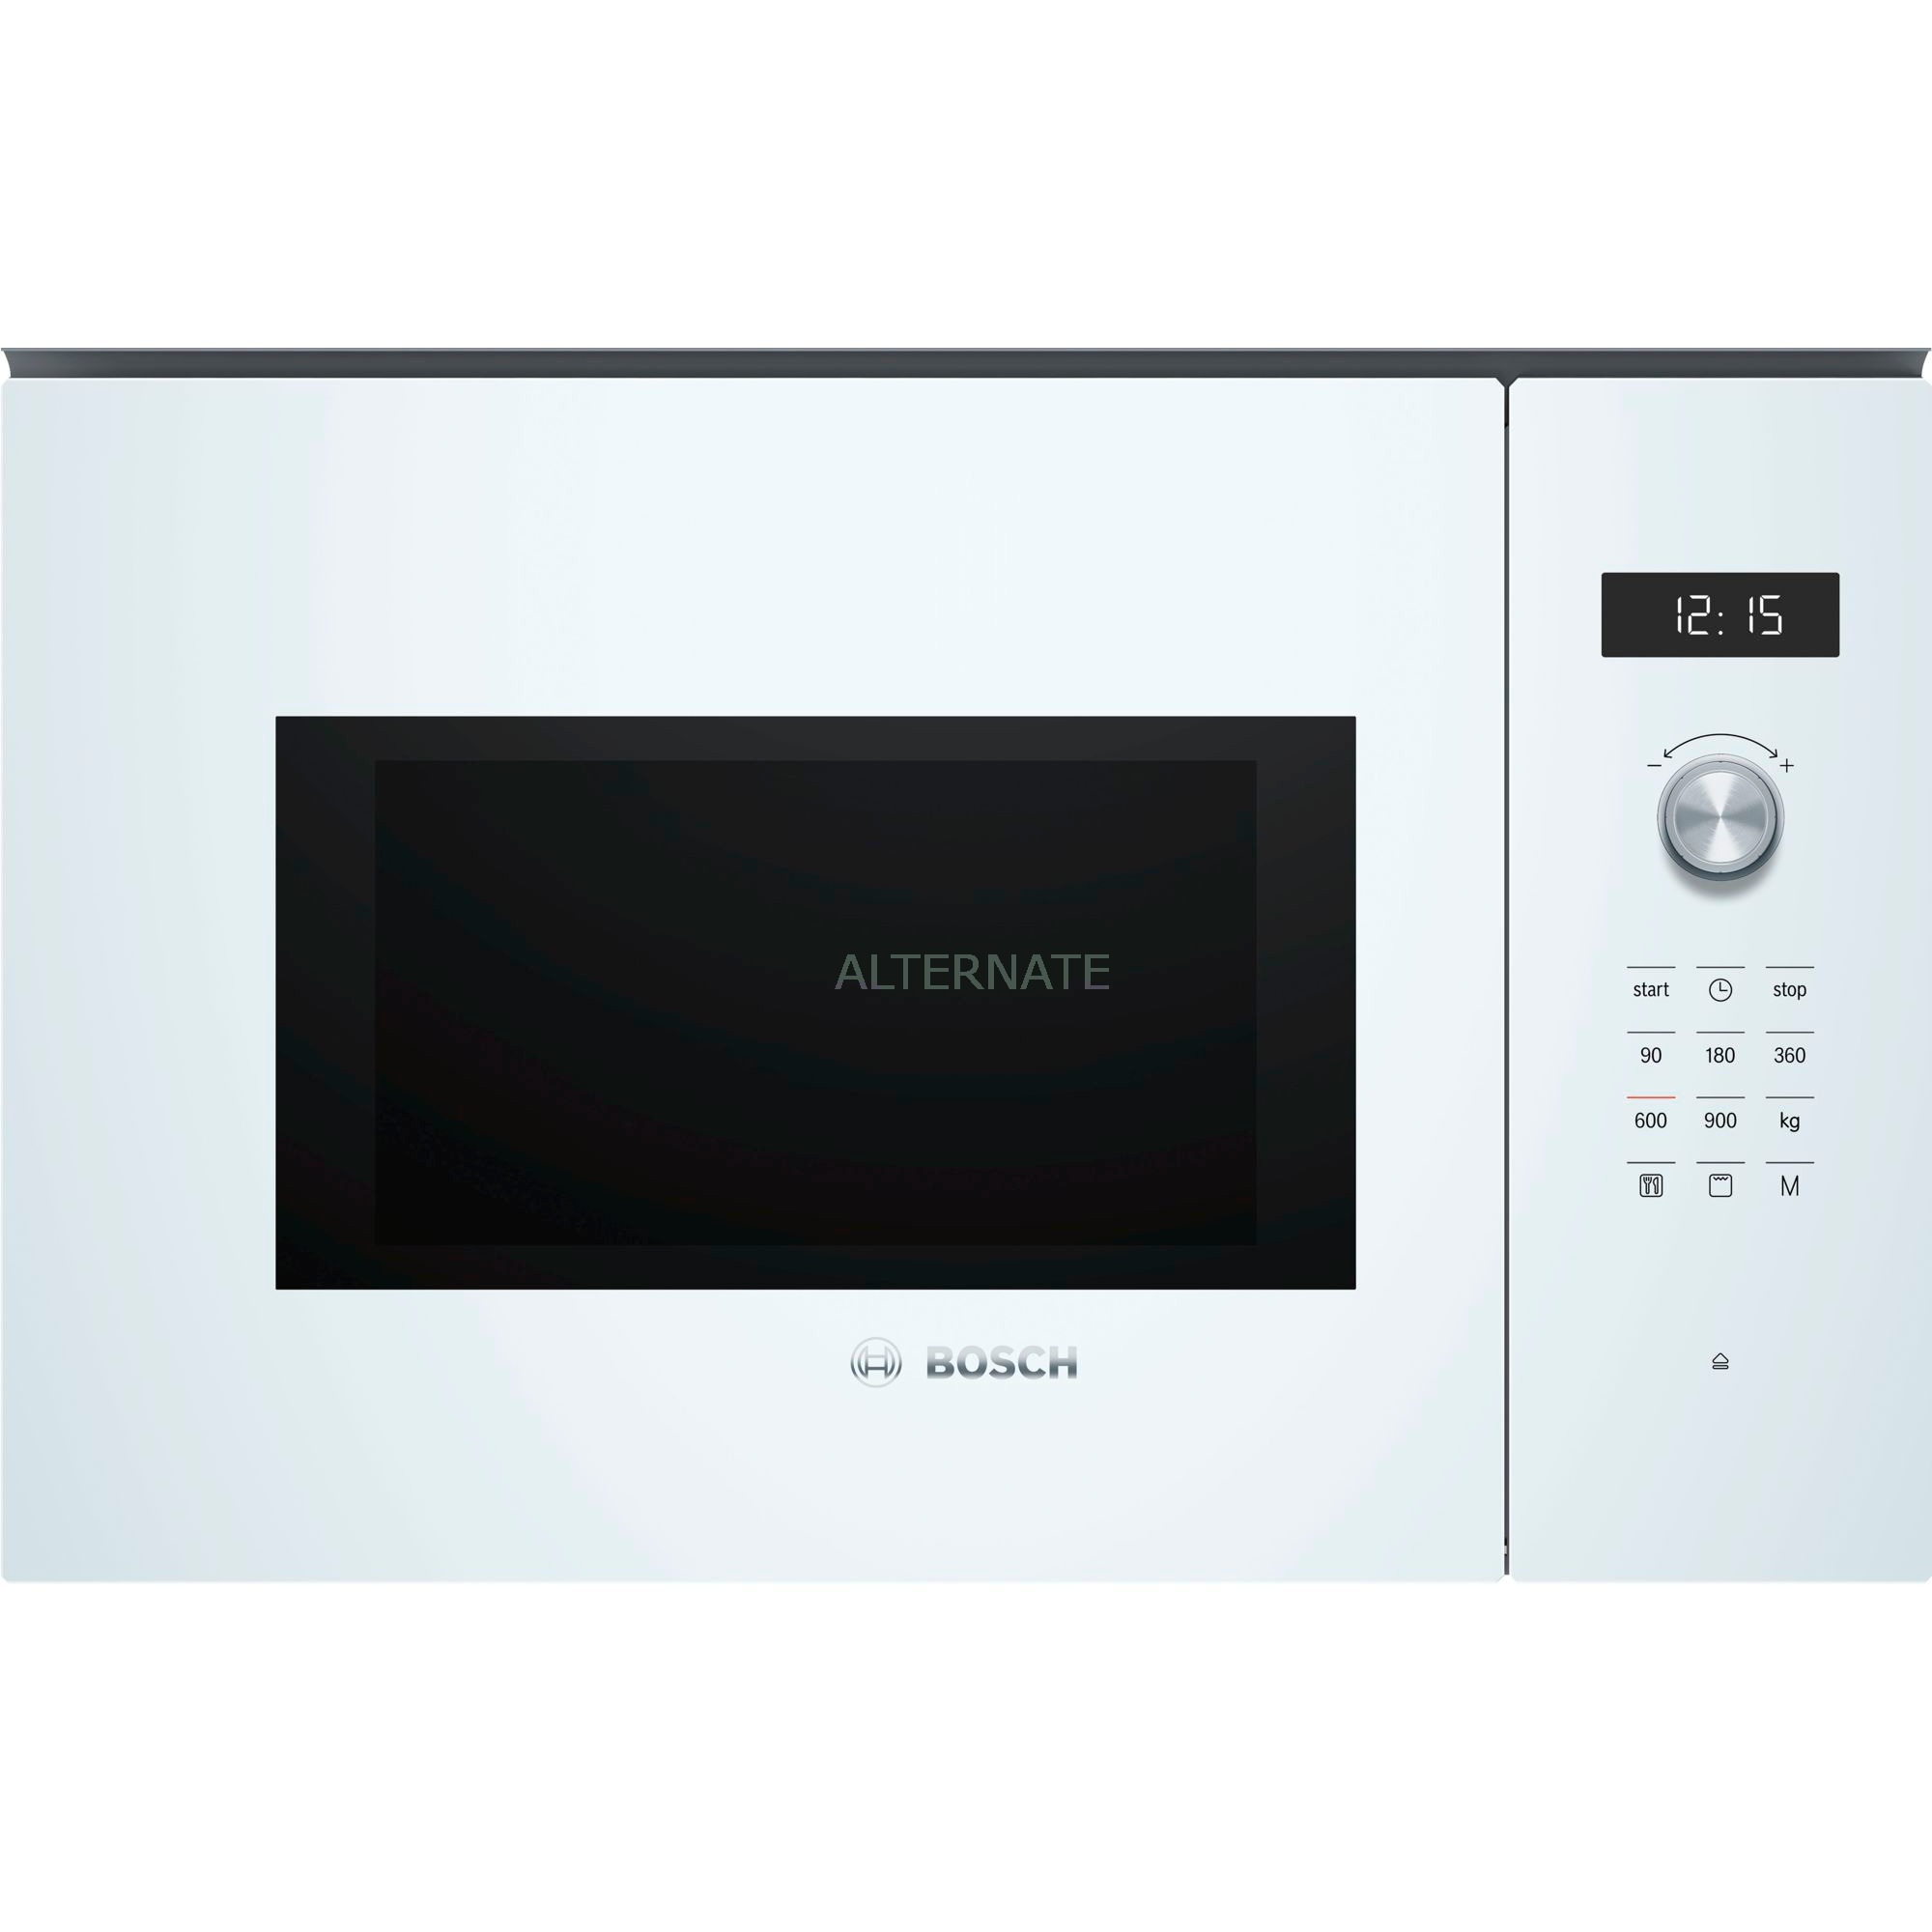 Serie 6 BEL554MW0 Intégré Micro-ondes grill 25L 900W Blanc micro-onde, Four à micro-ondes